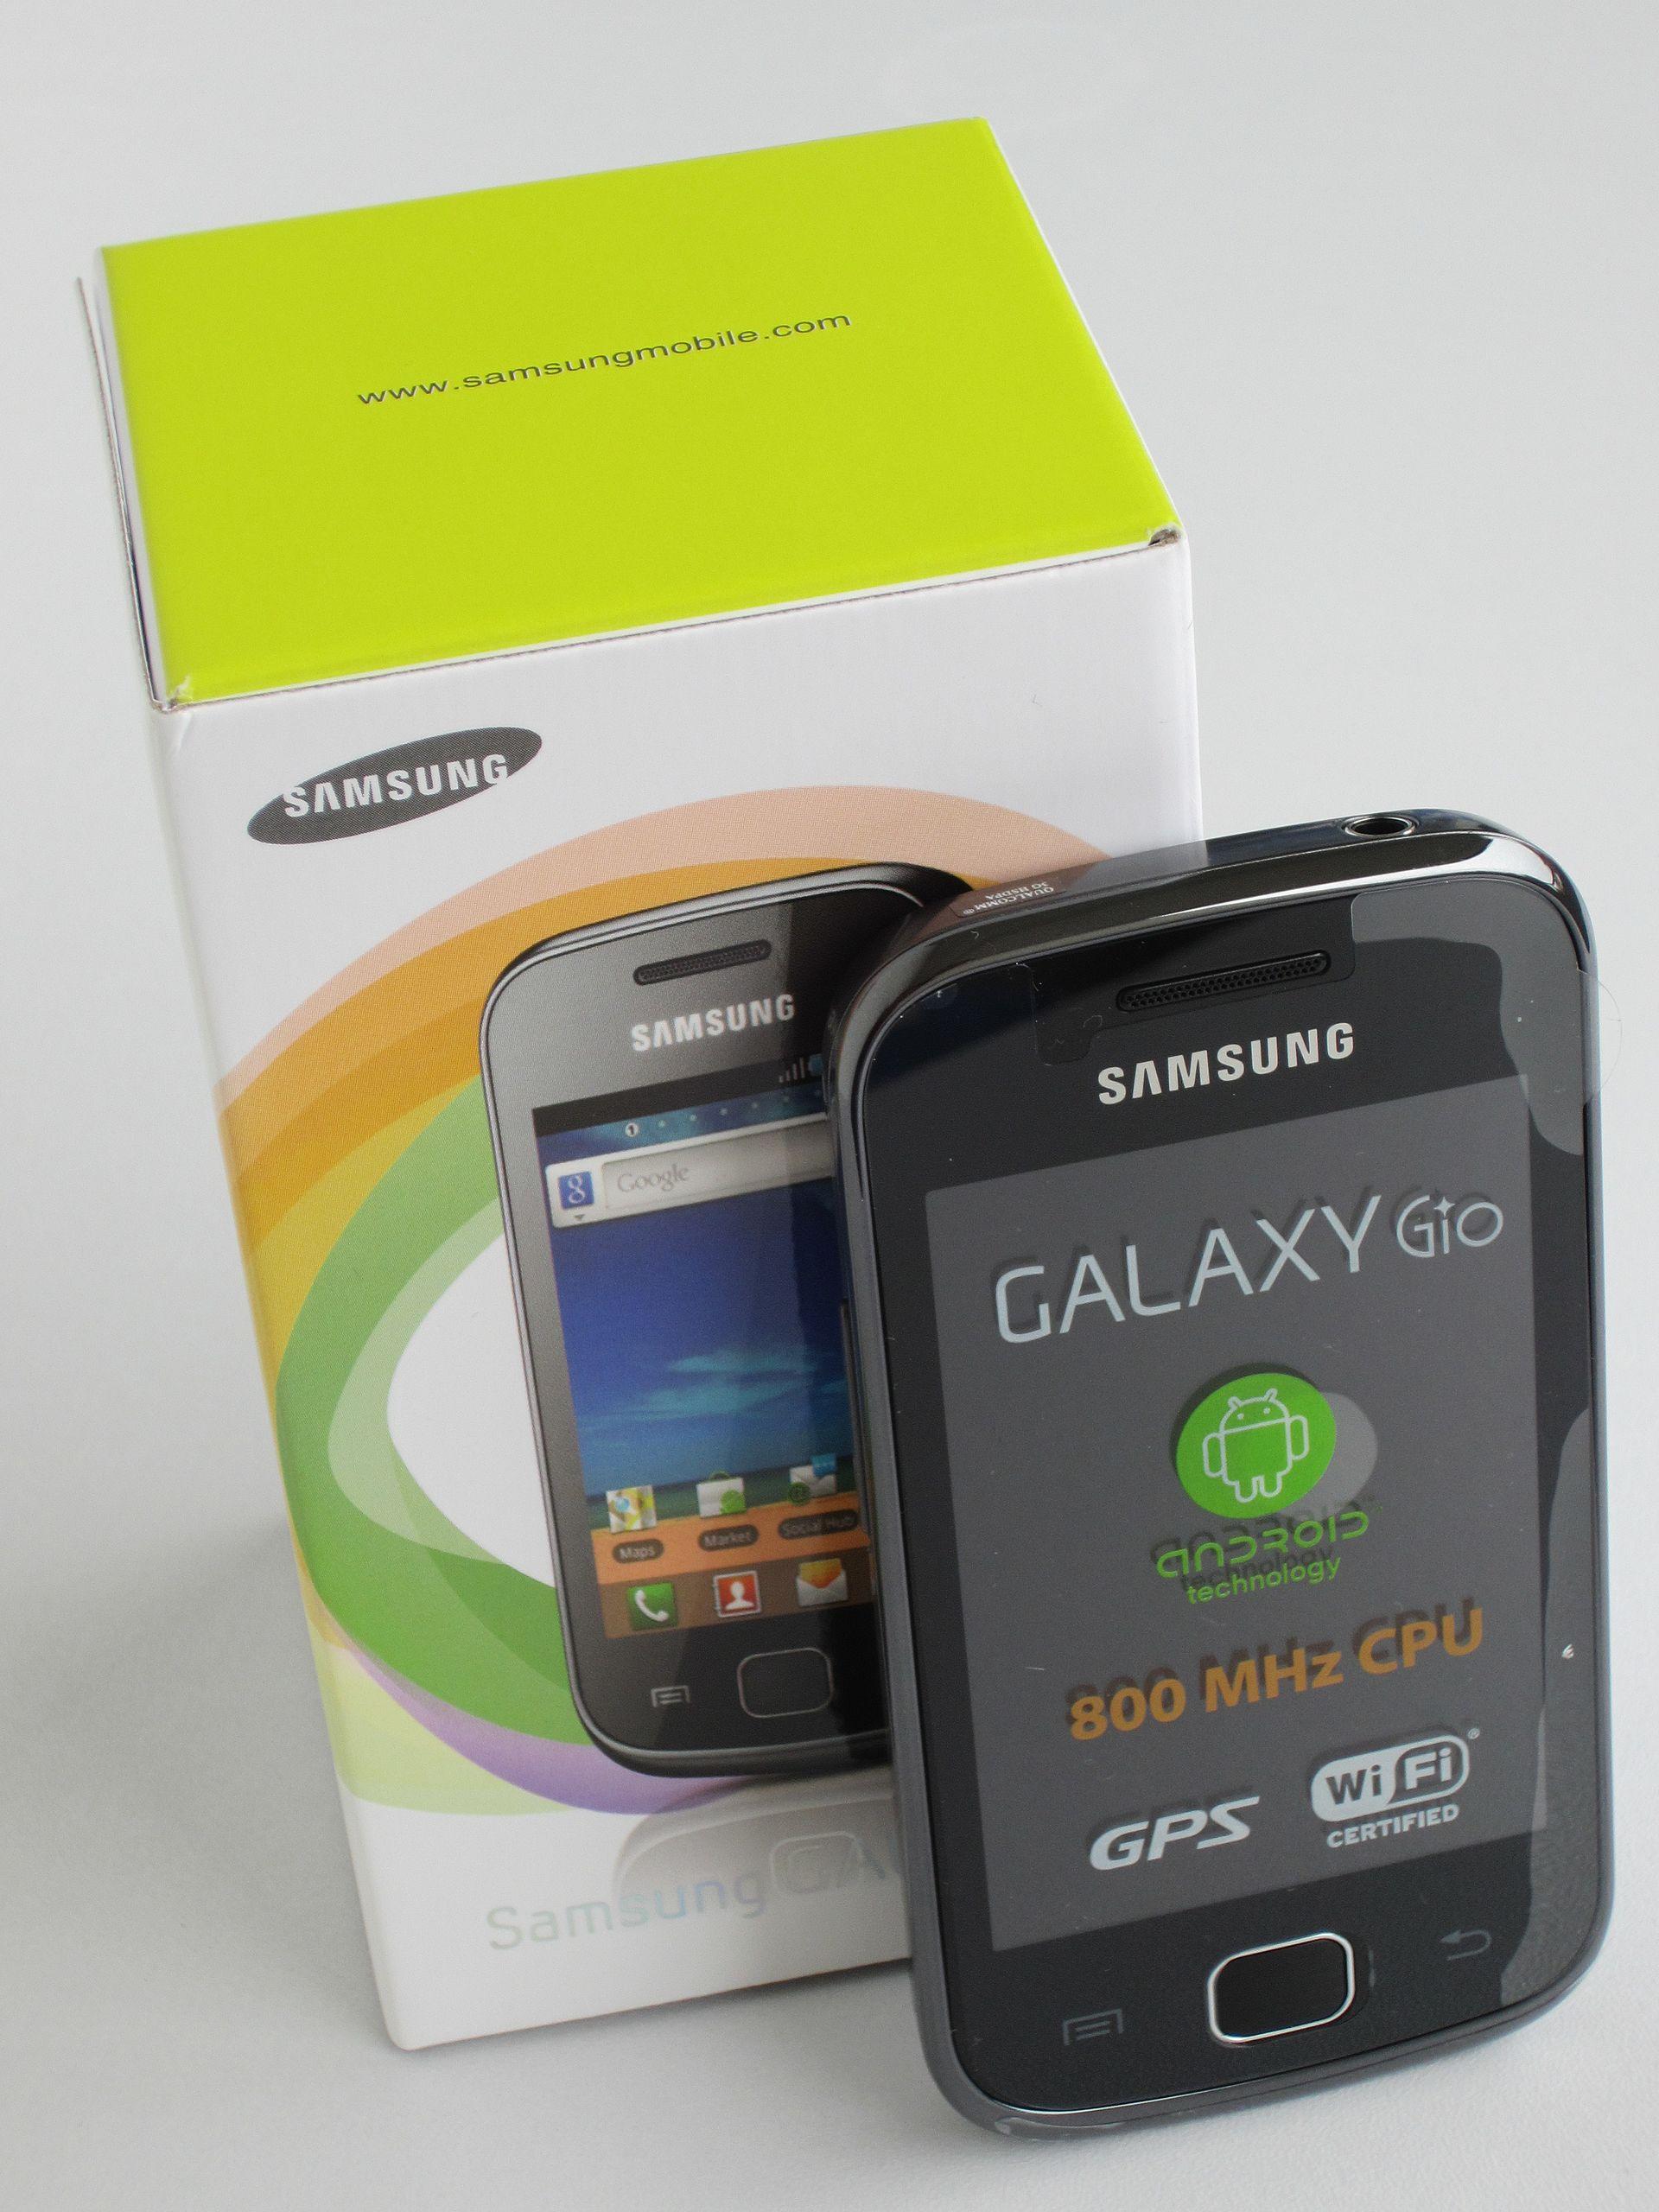 Samsung Galaxy Gio Wikipedia